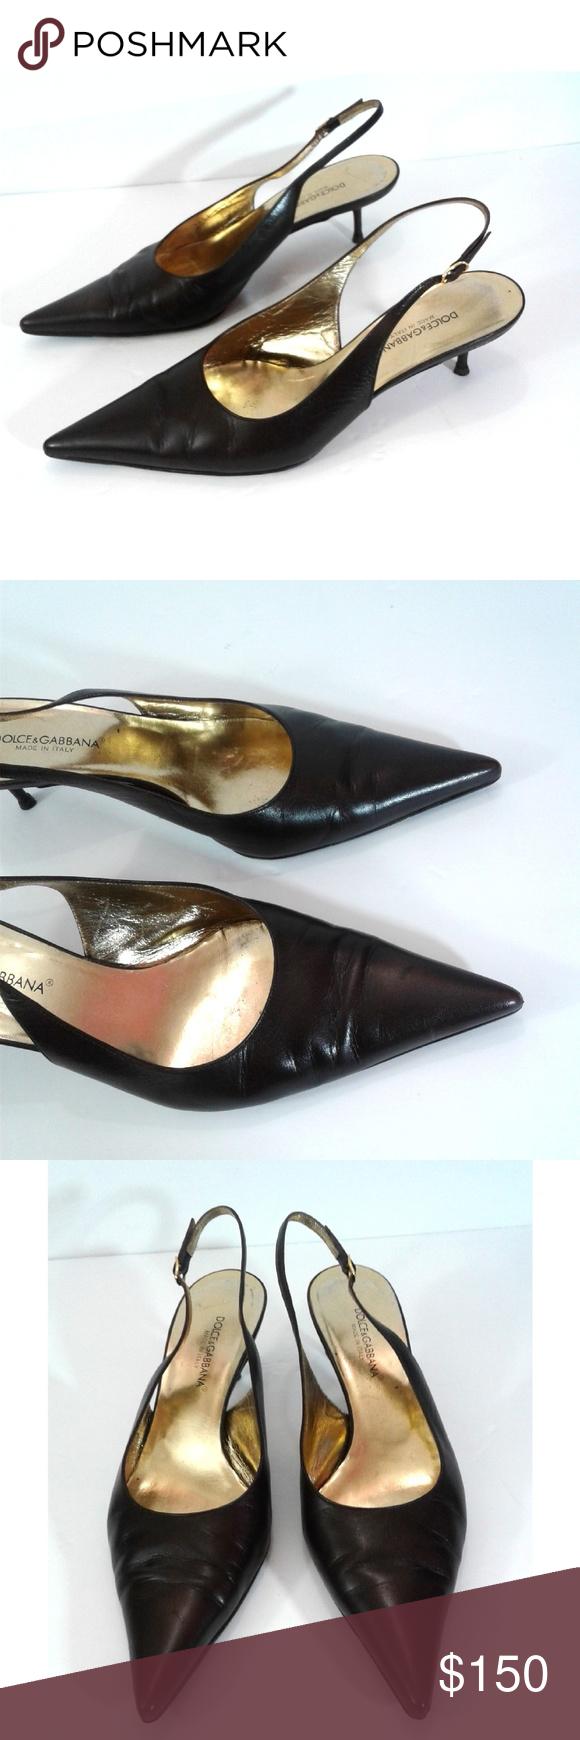 Dolce Gabbana Slingback Kitten Heel Leather 8 5 Dolce Gabbana Shoes Dolce And Gabbana Clothes Design